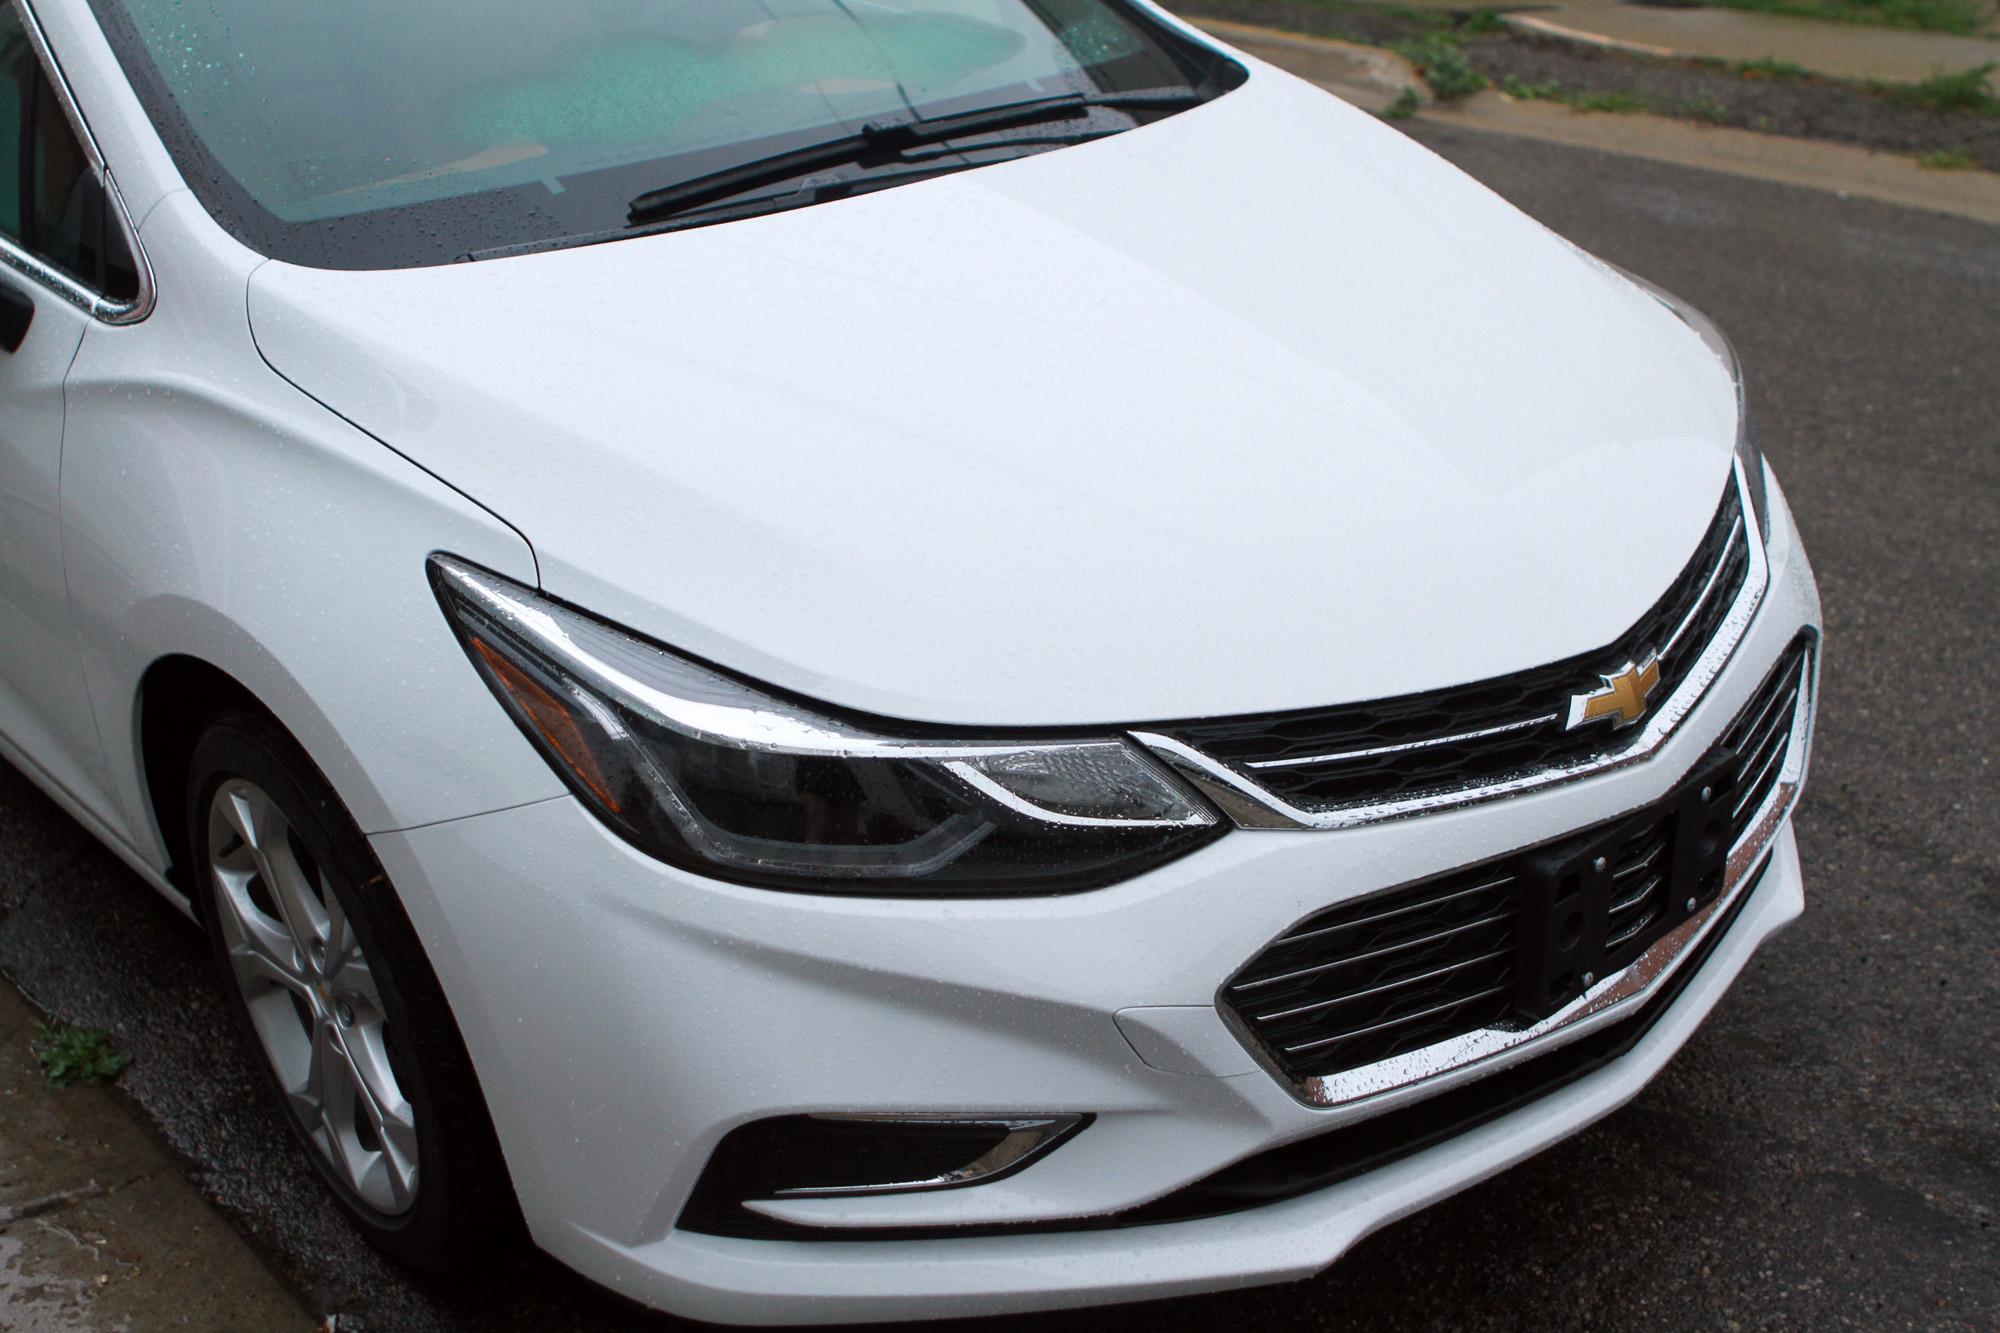 White 2016 Chevrolet Cruze